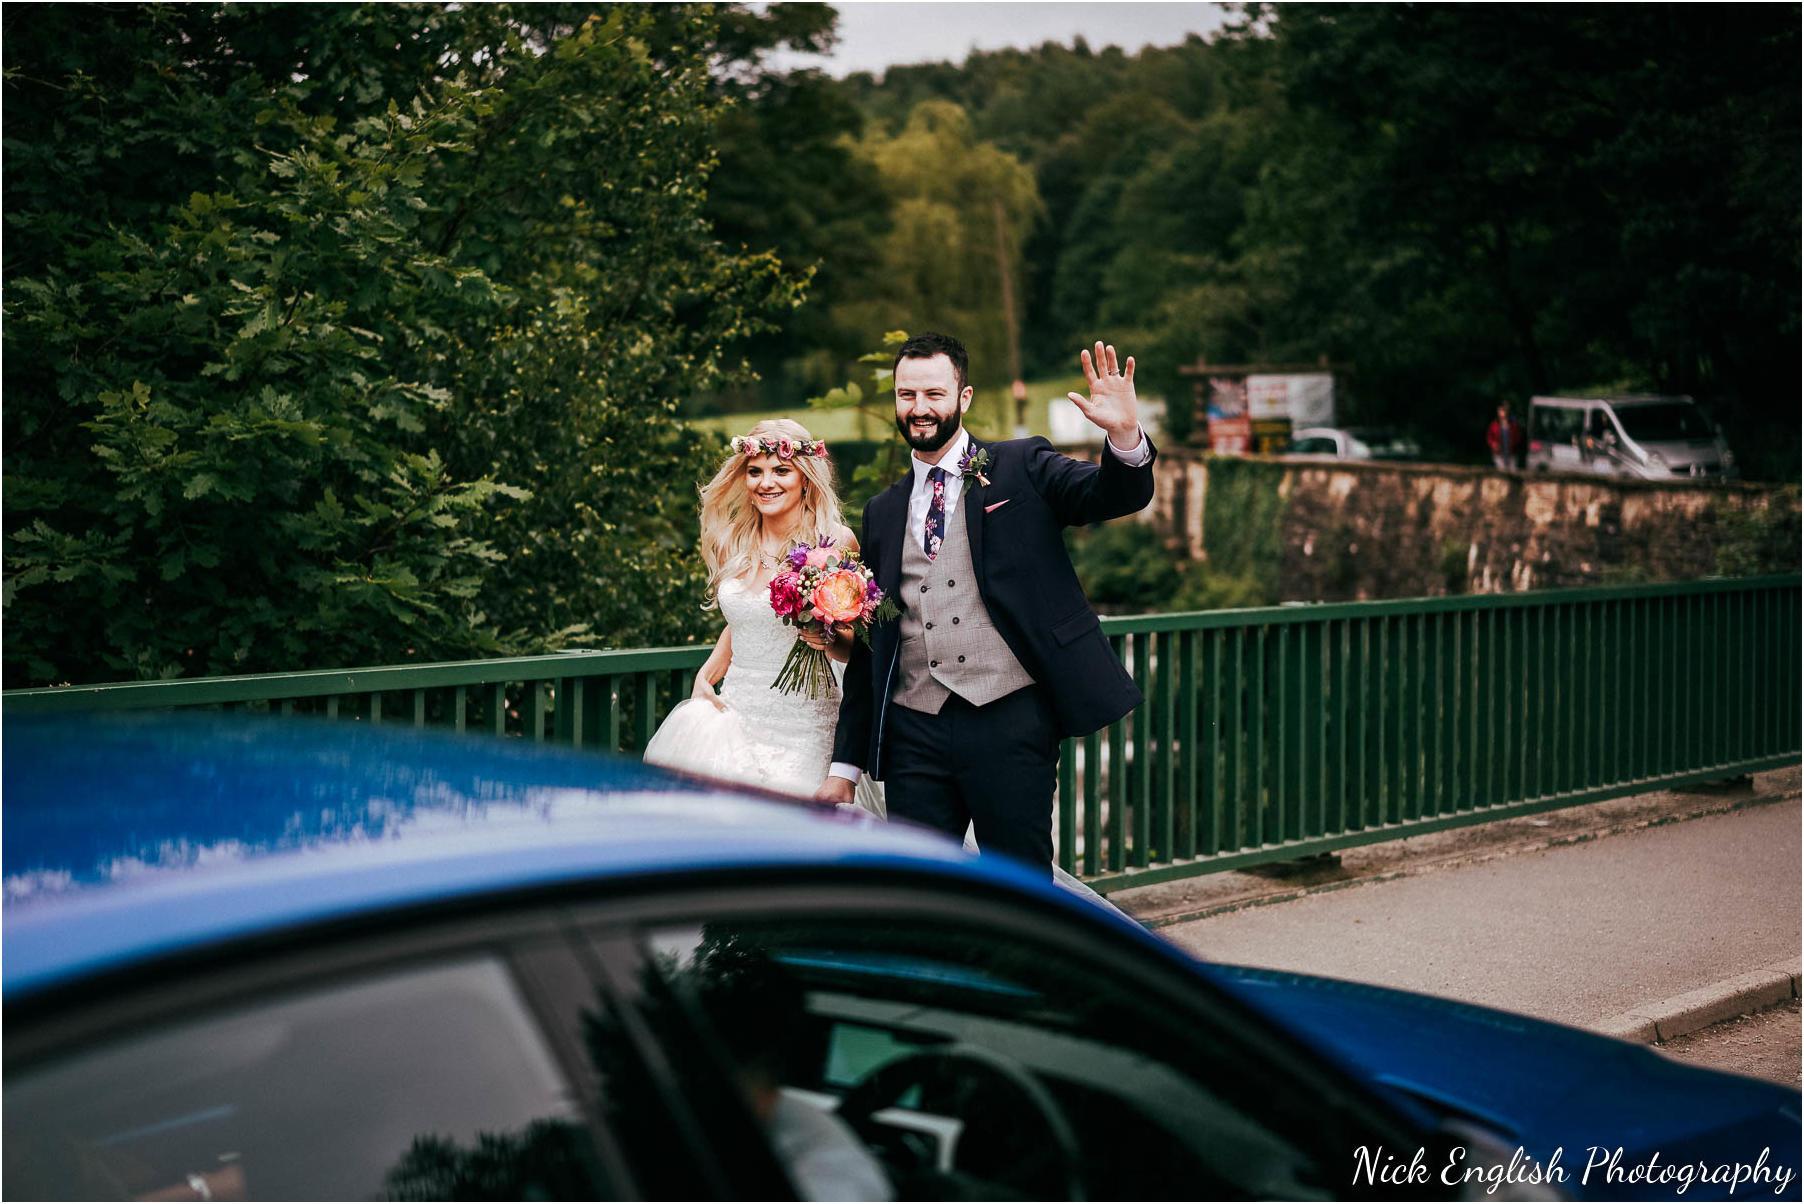 Whitebottom_Farm_Wedding_Manchester_Photograph-39.jpg